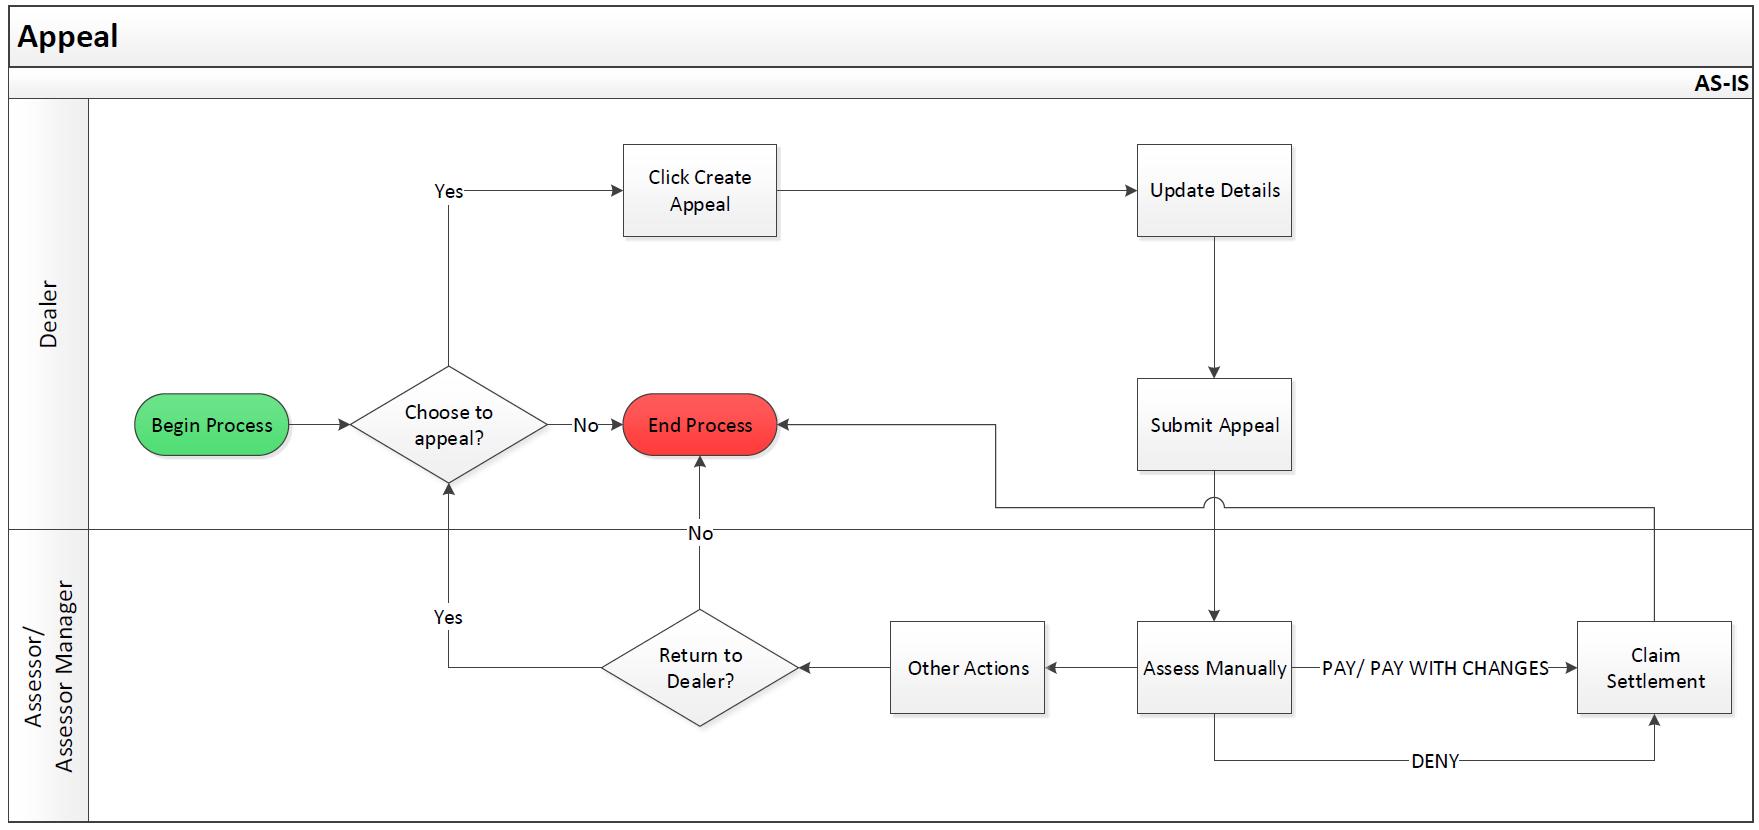 Appeal process flow